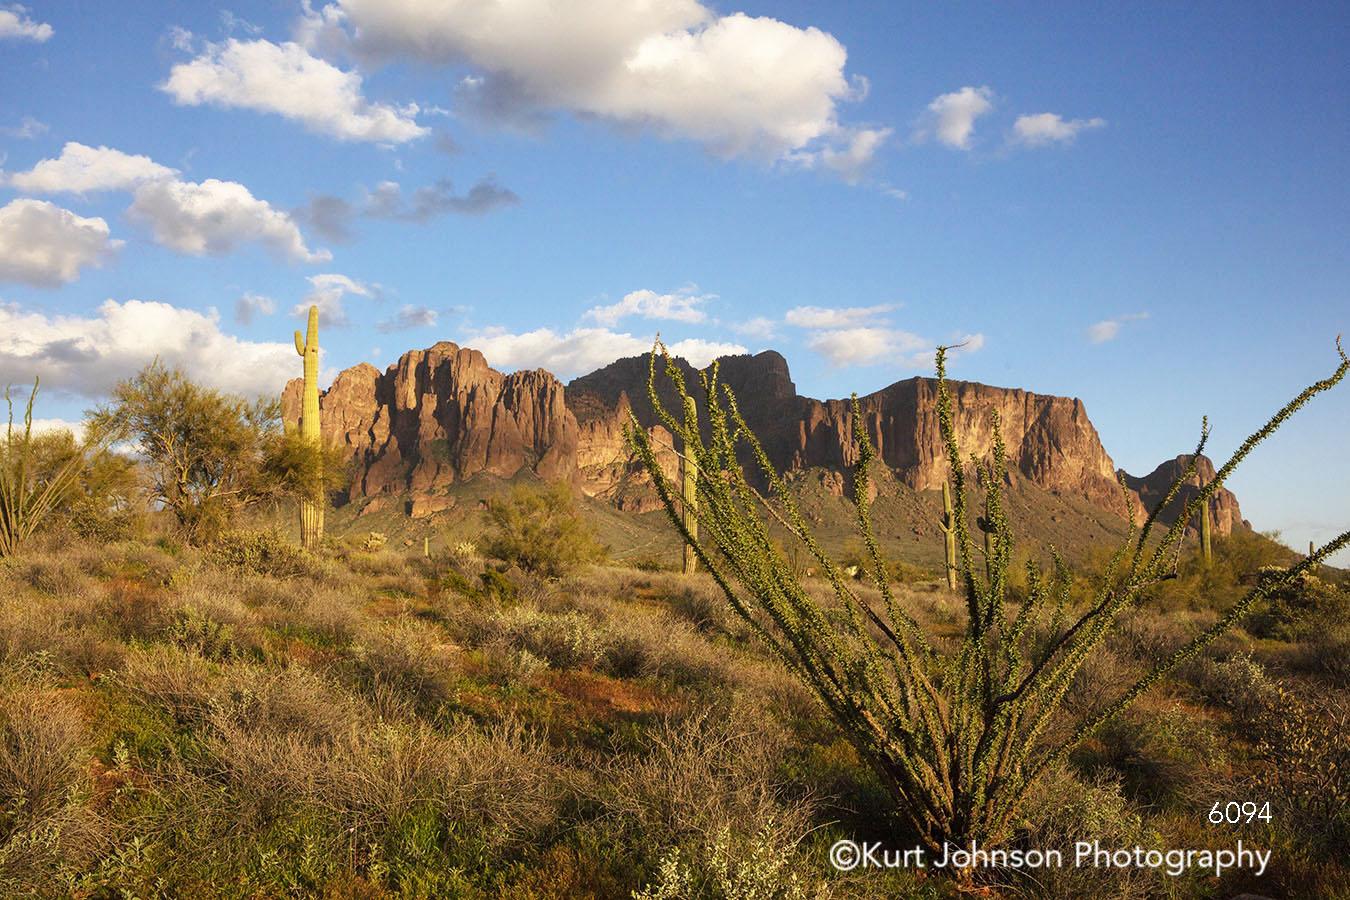 arizona mountain desert landscape southwest cacti cactus blue sky clouds mountains green trees indigenous